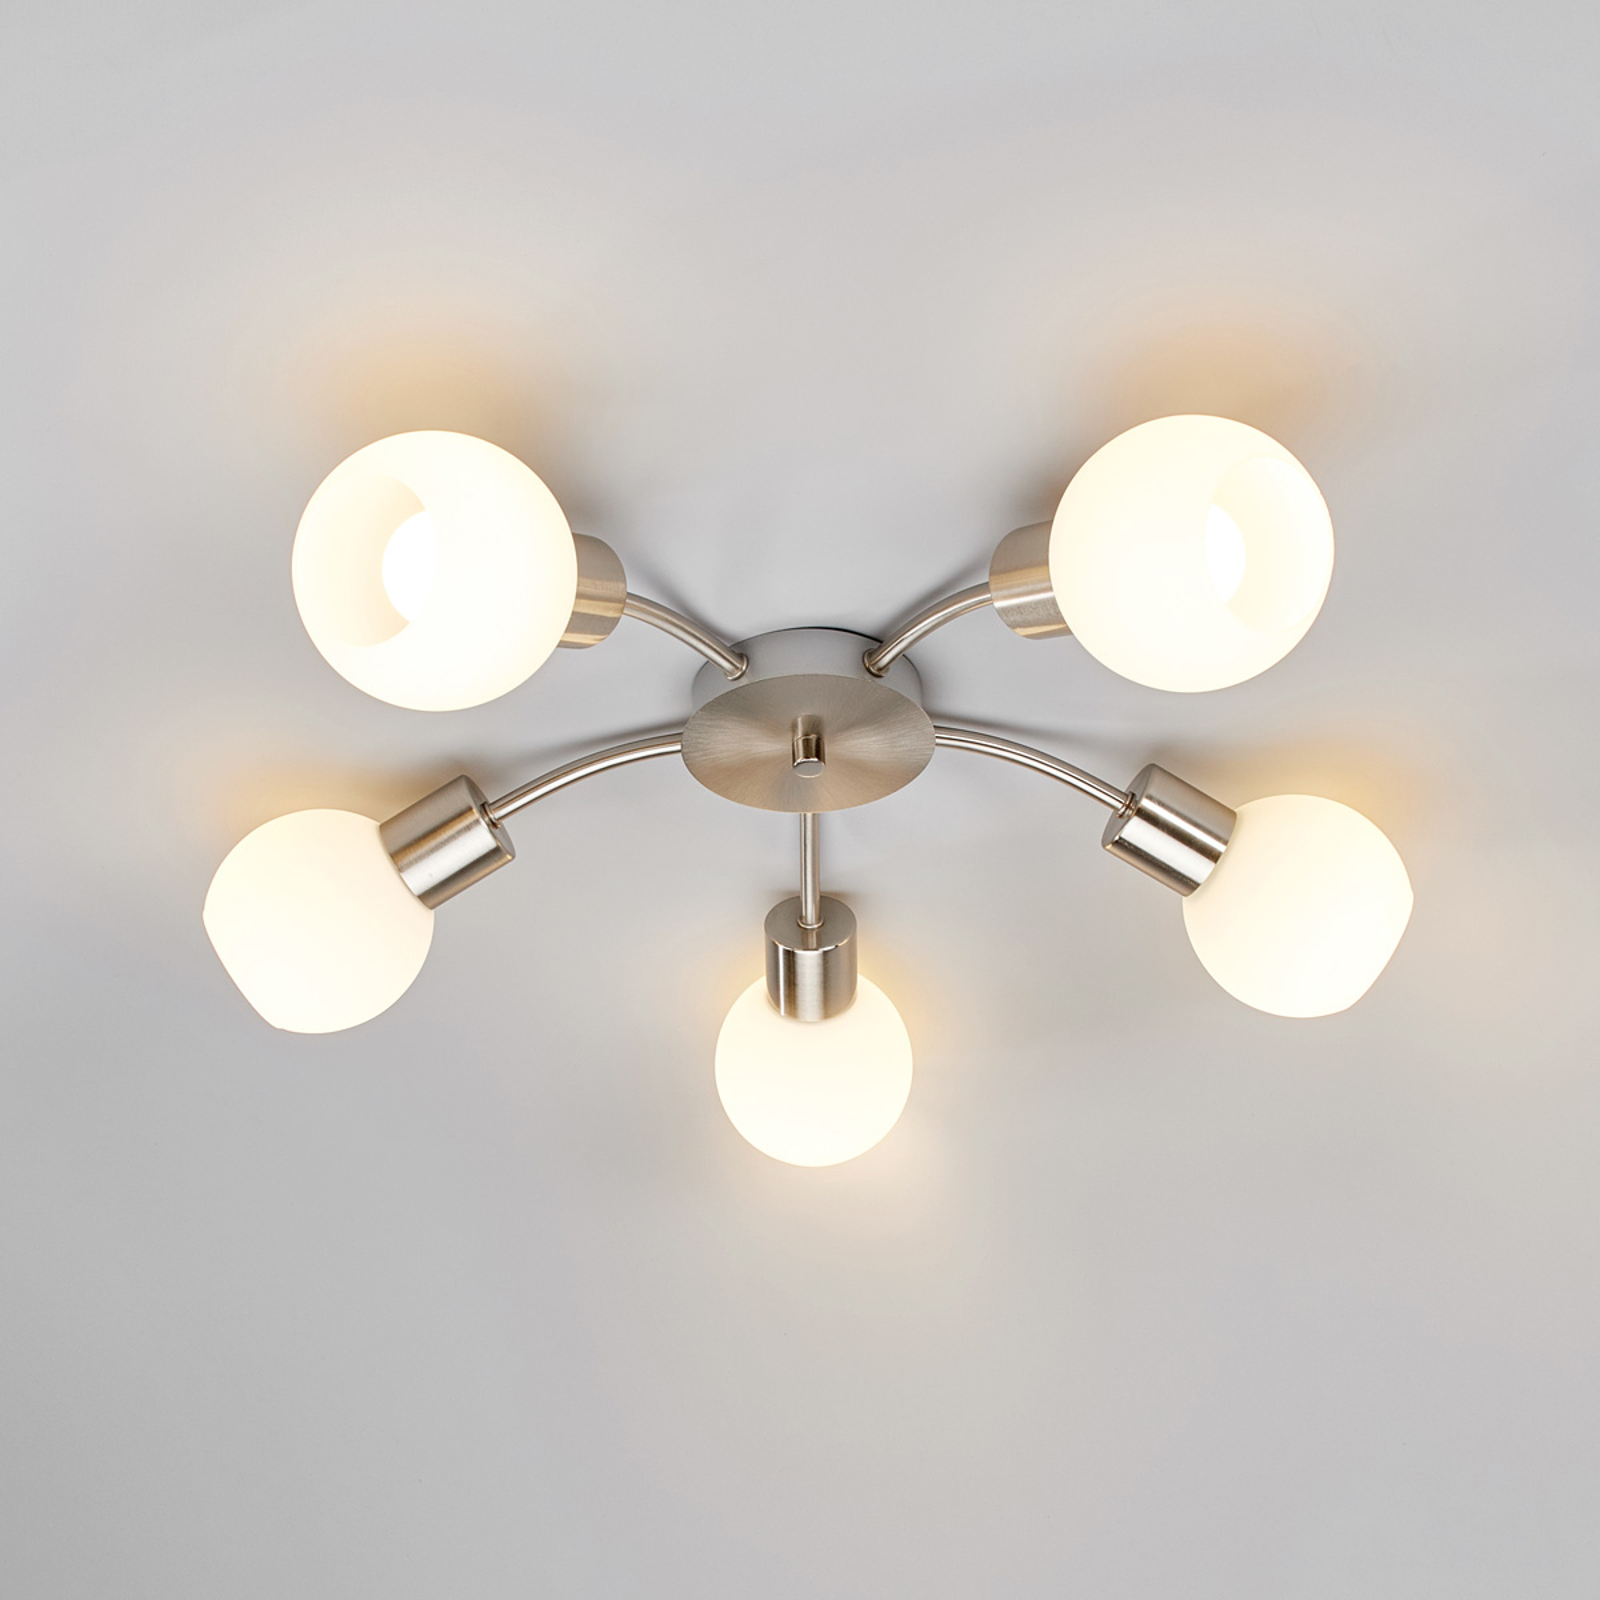 Okrągła 5-pkt. lampa sufitowa LED ELAINA, niklowa